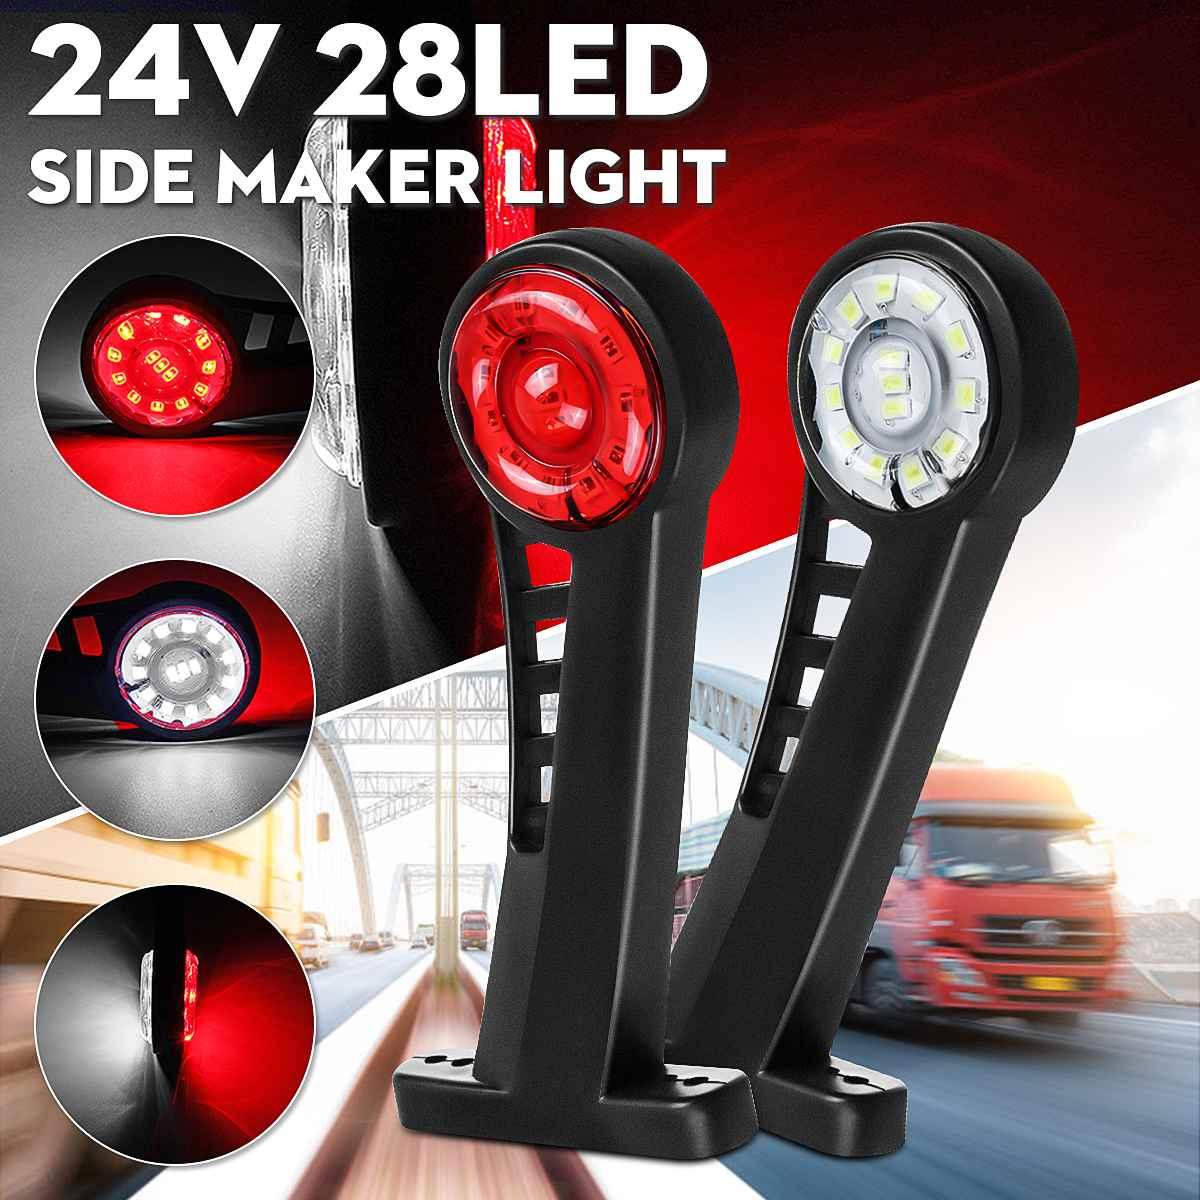 2pcs 24V Car Truck Elbow Side Marker Lights Indicator Light Warning Signal Lamp Rear Tail Light for Trailer Van Lorry Bus